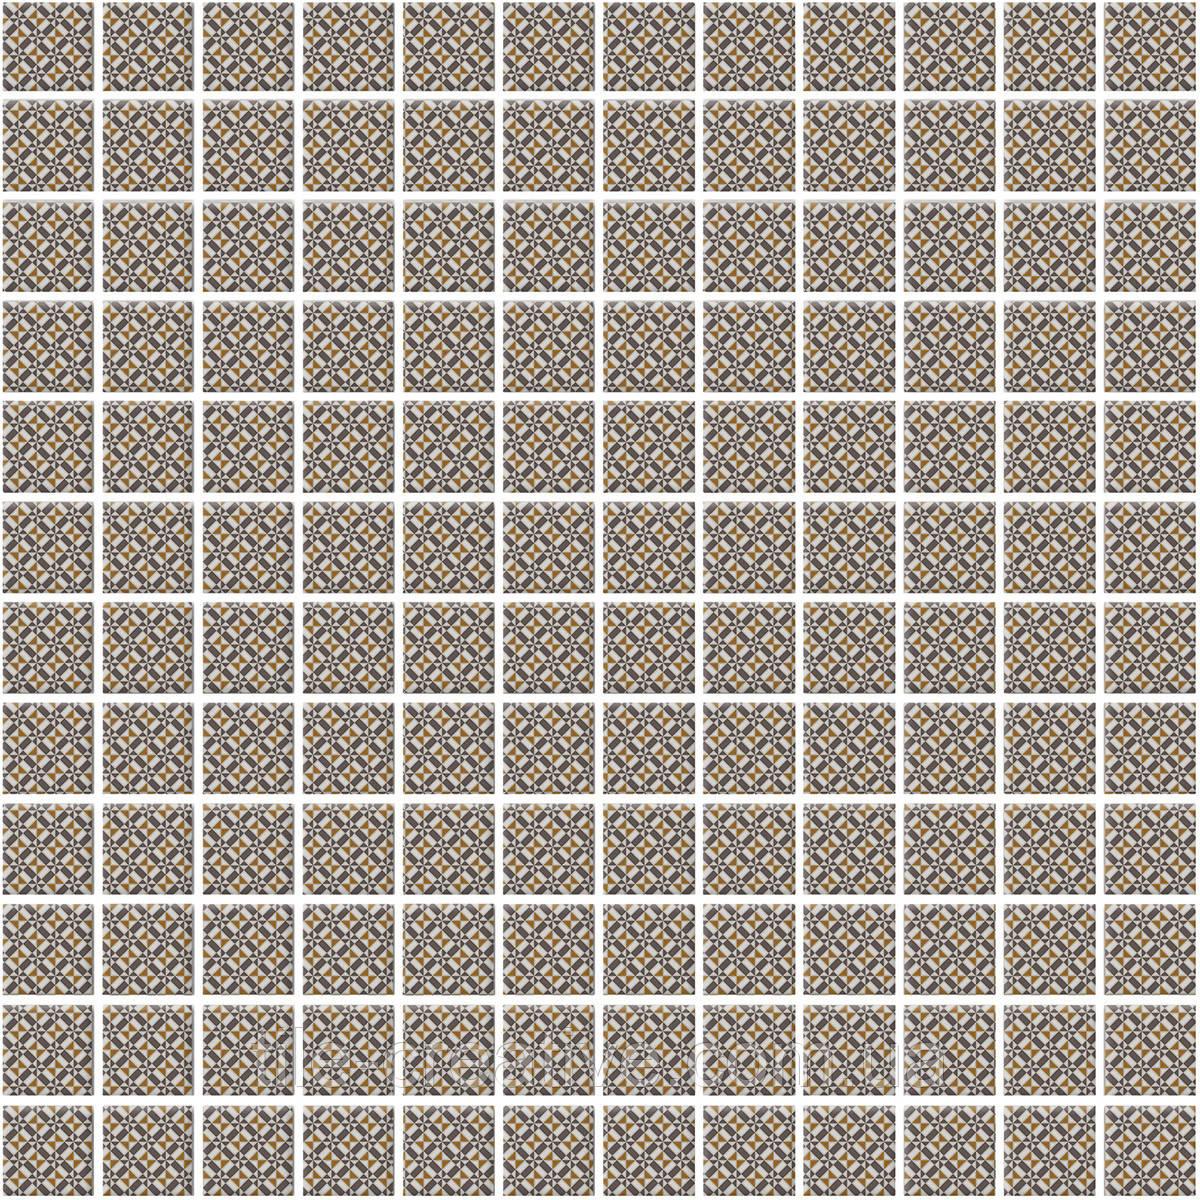 Мозаика Кастелло орнамент беж 29,8х29,8х3,5 20104